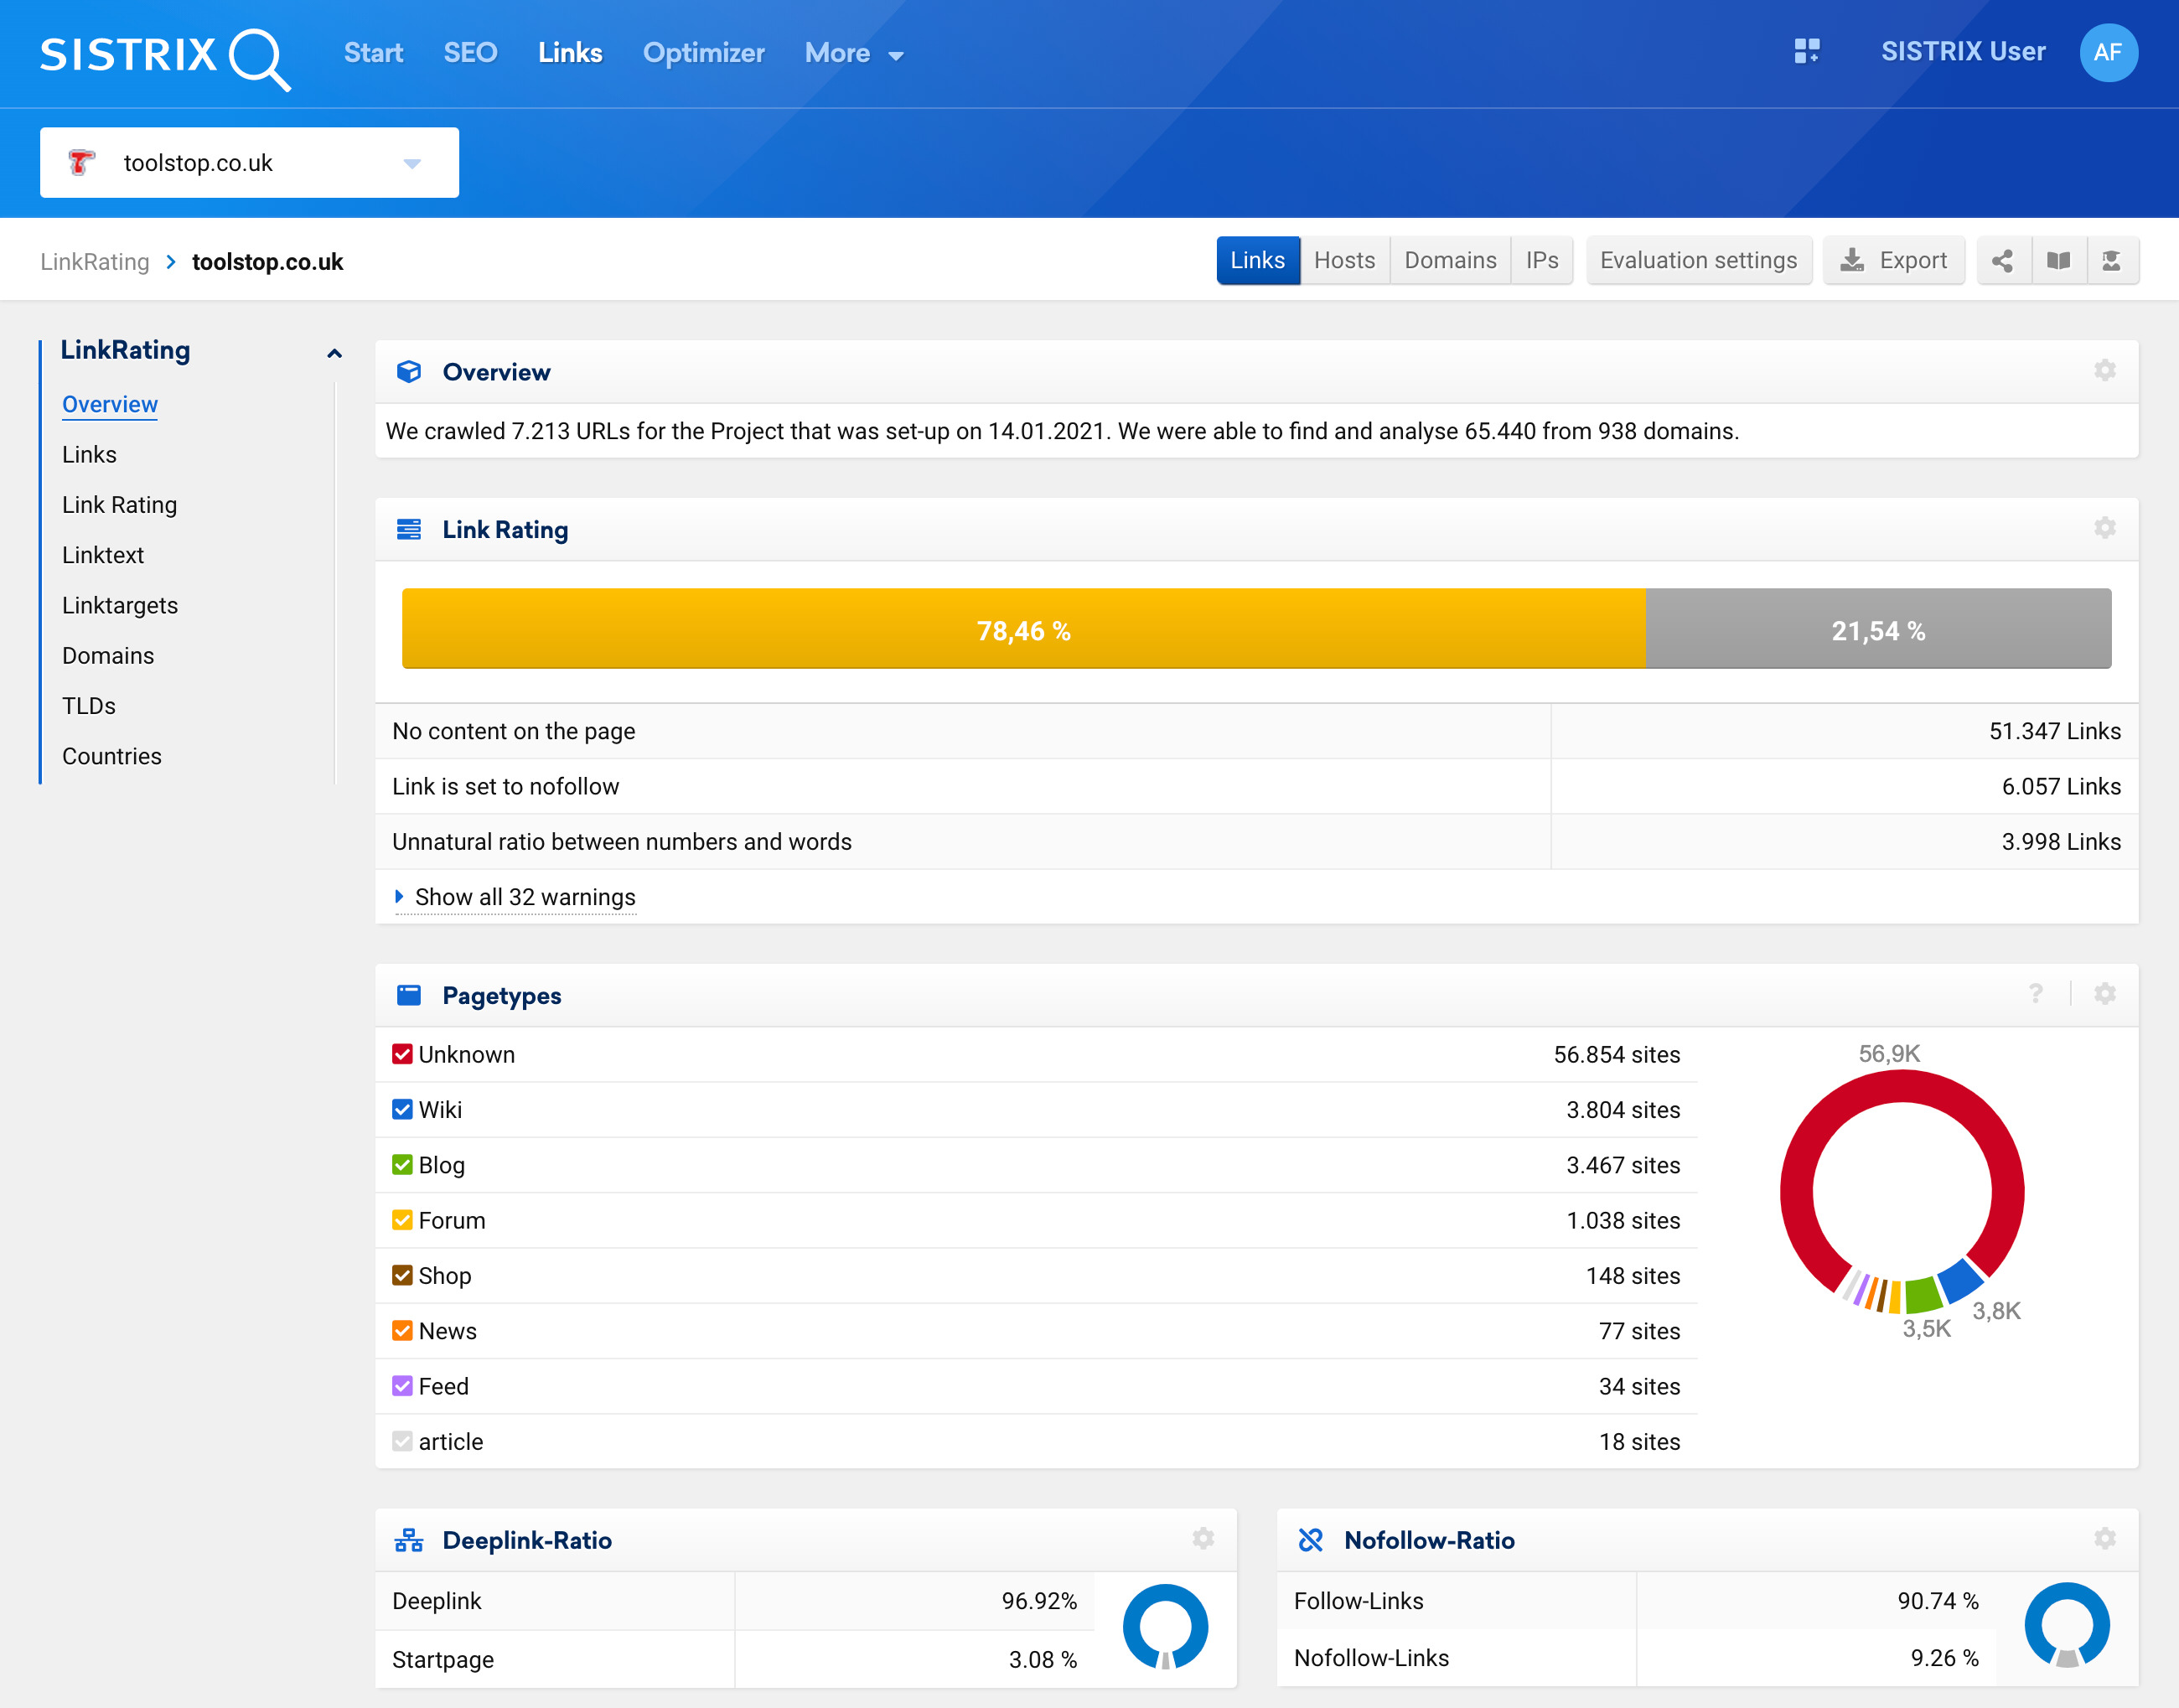 LinkRating Dashboard on sistrix.com: Example toolstop.co.uk